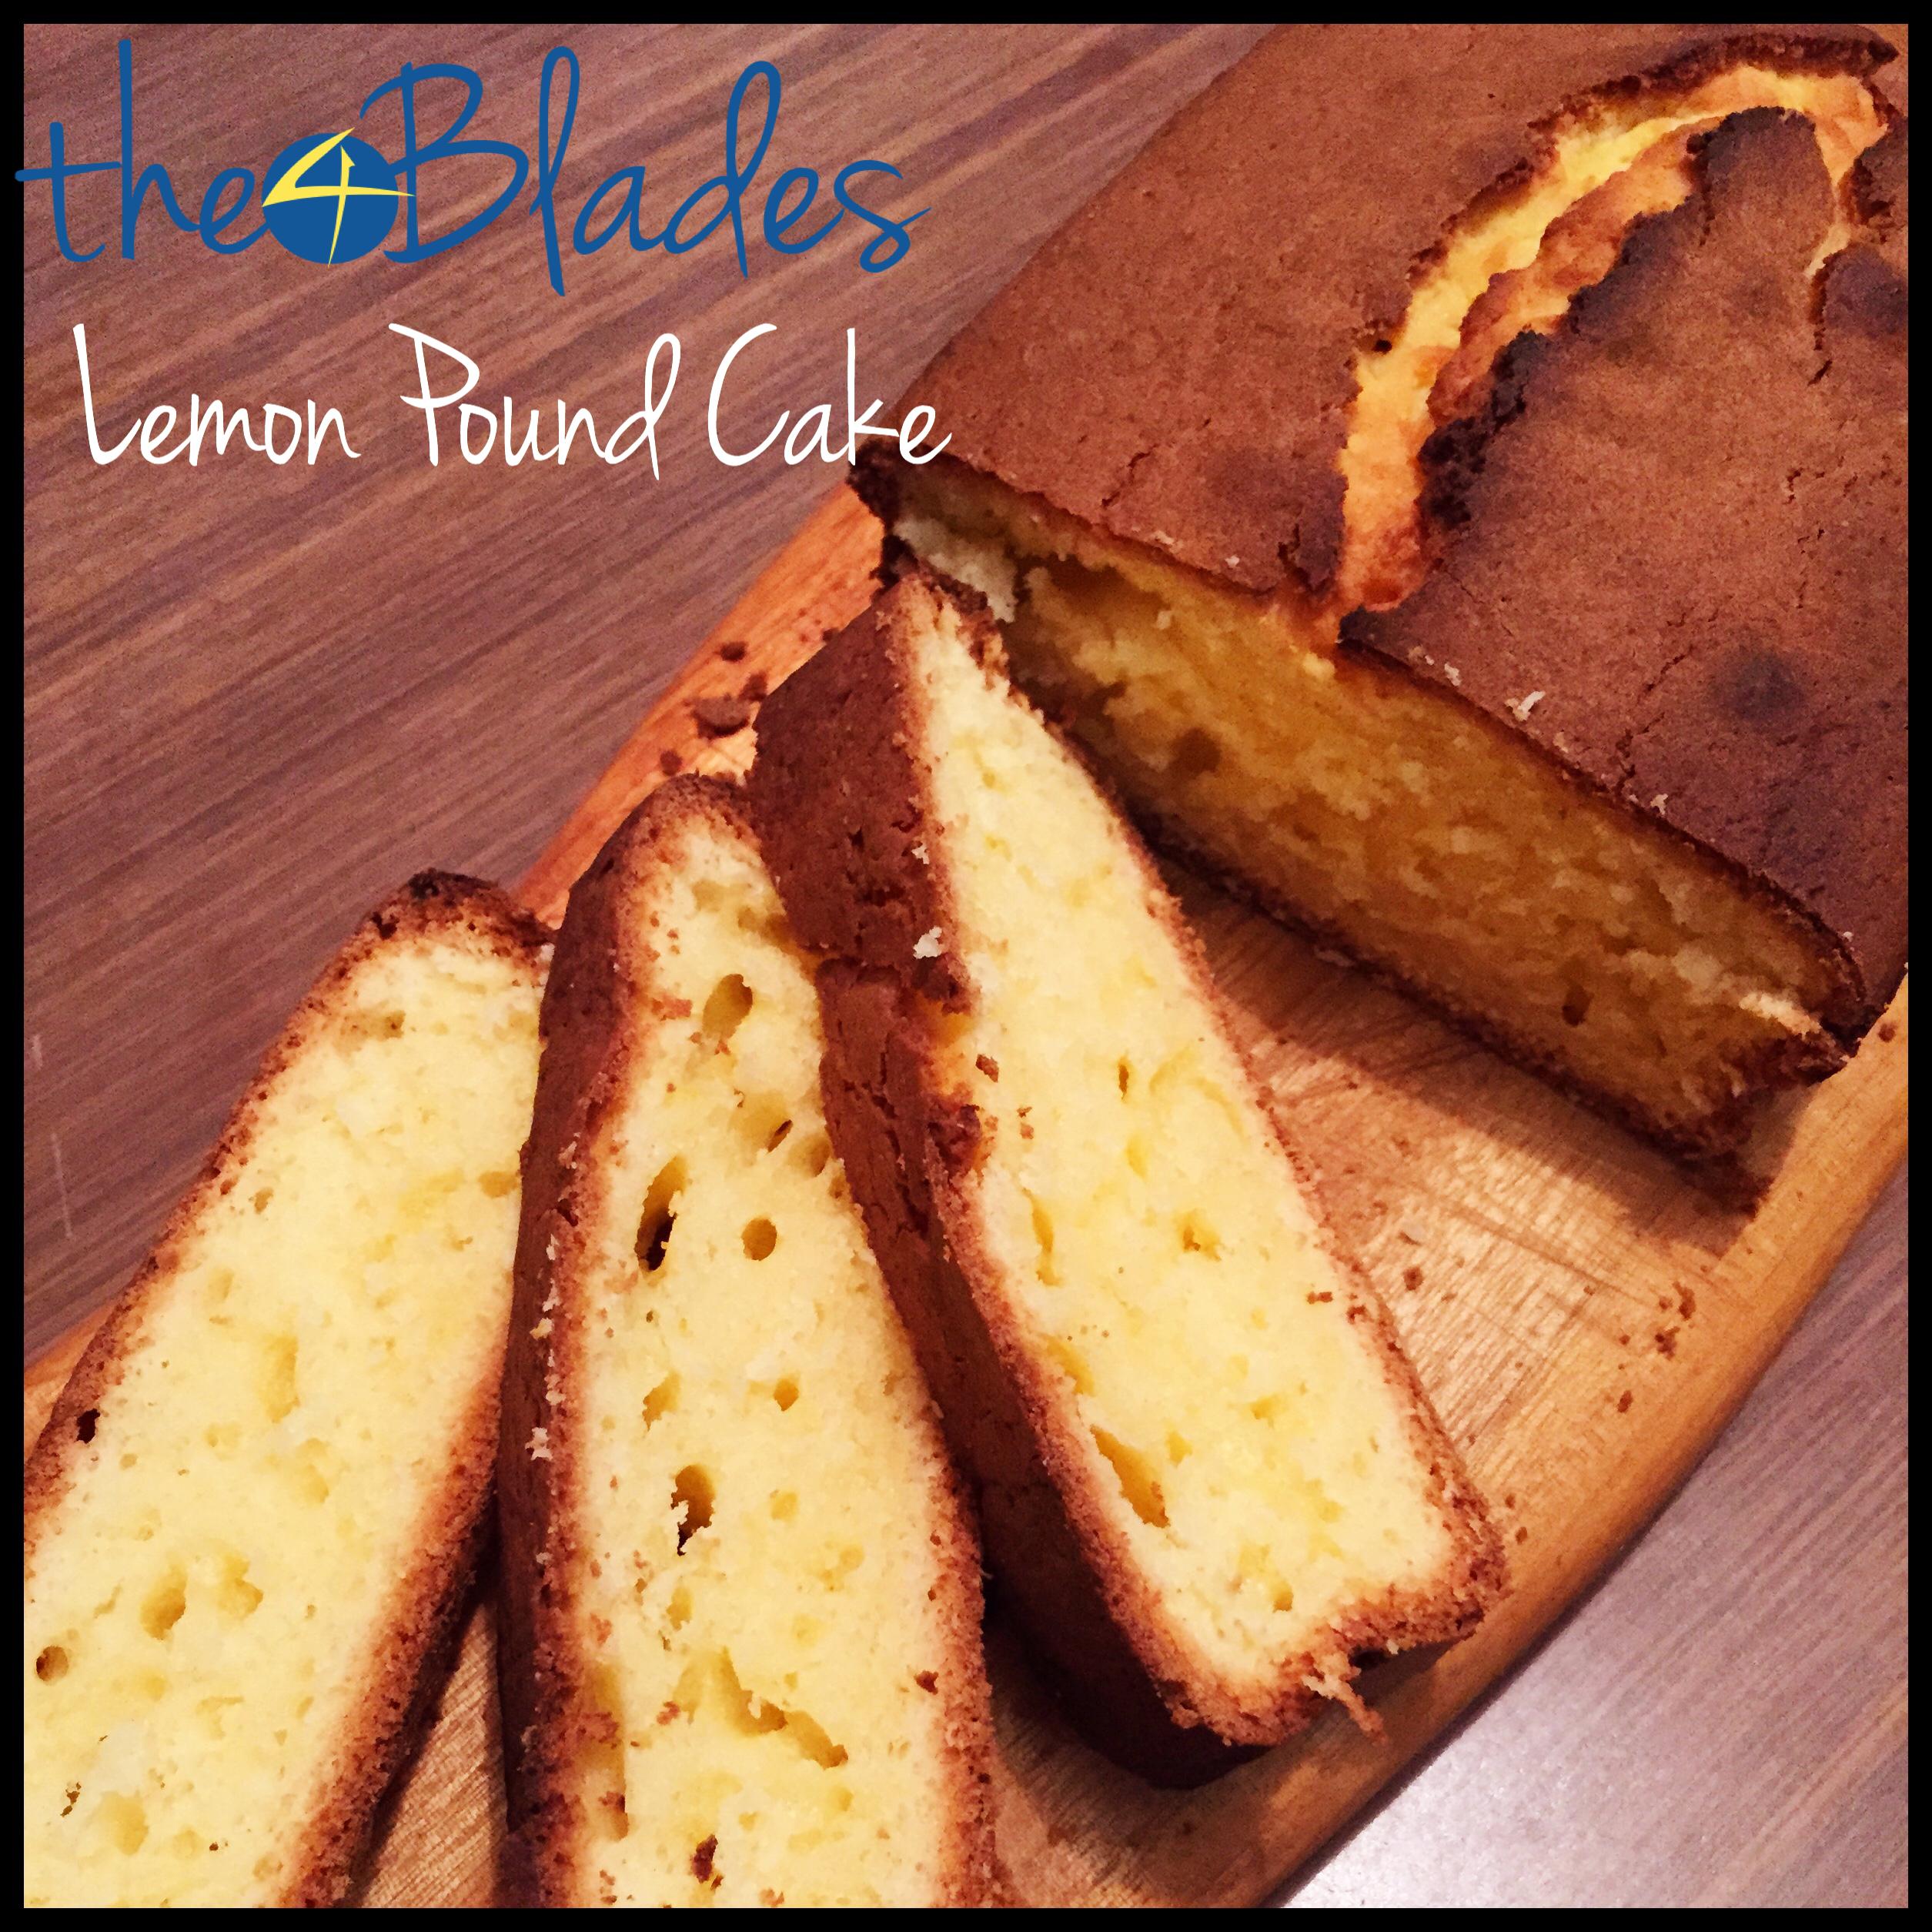 Lemon Pound Cake Thermomix